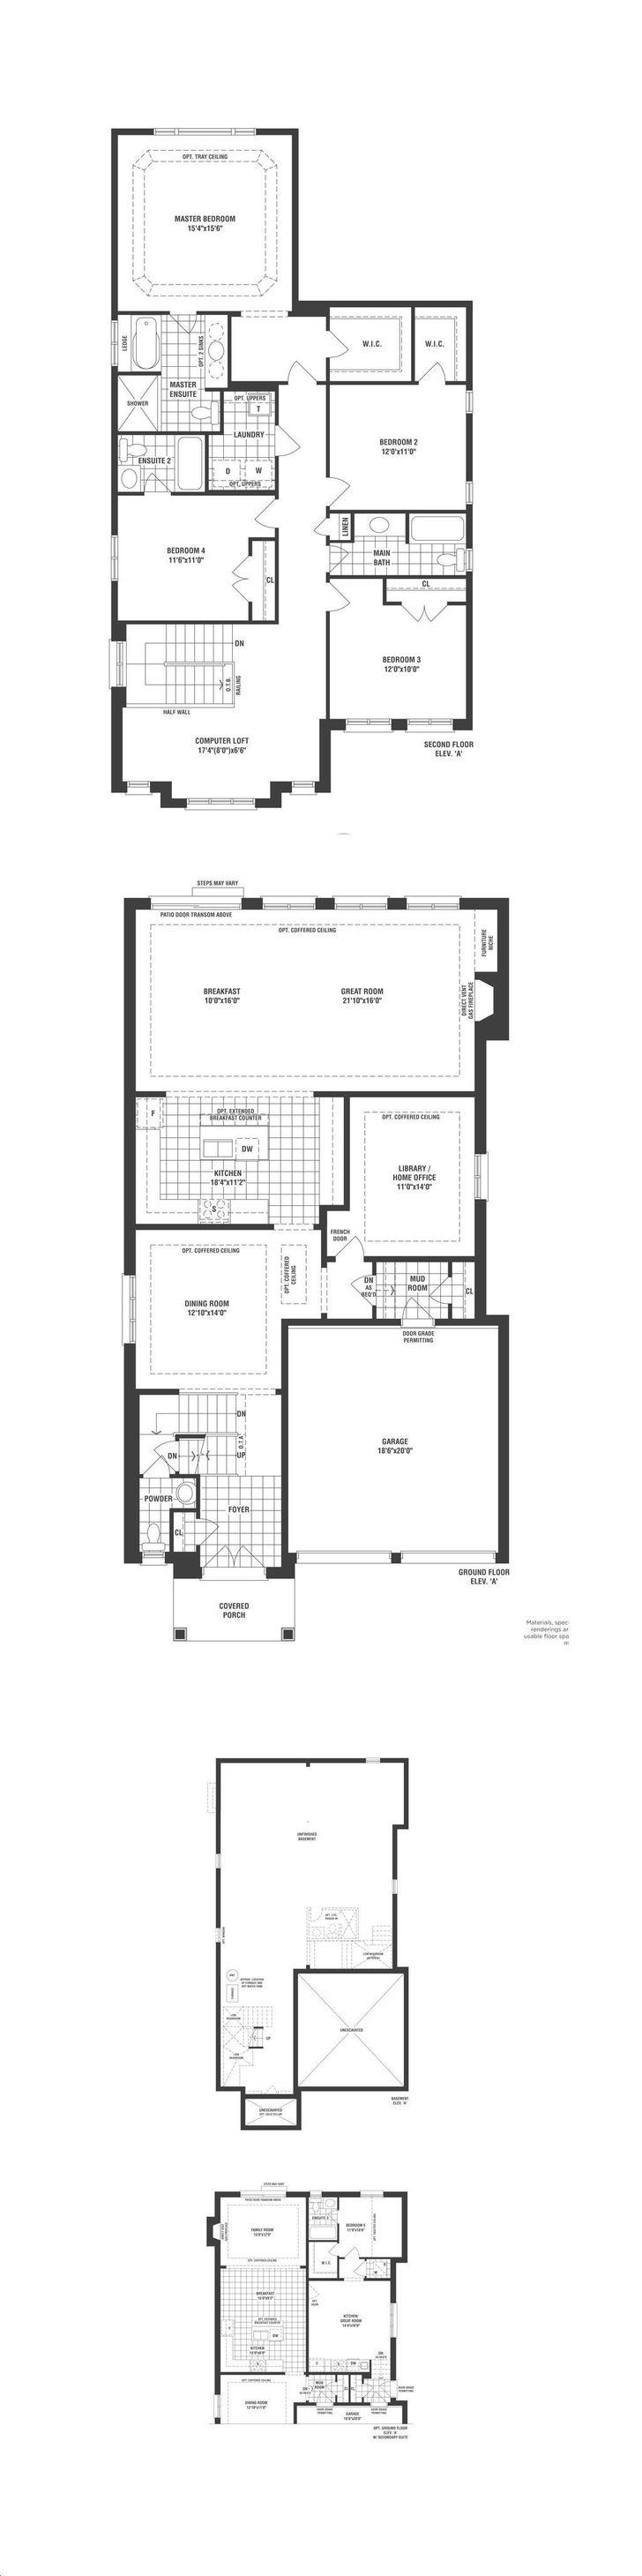 Paris Riverside By Crystalhomes Cotswold Floorplan 3 Bed 2 5 Bath